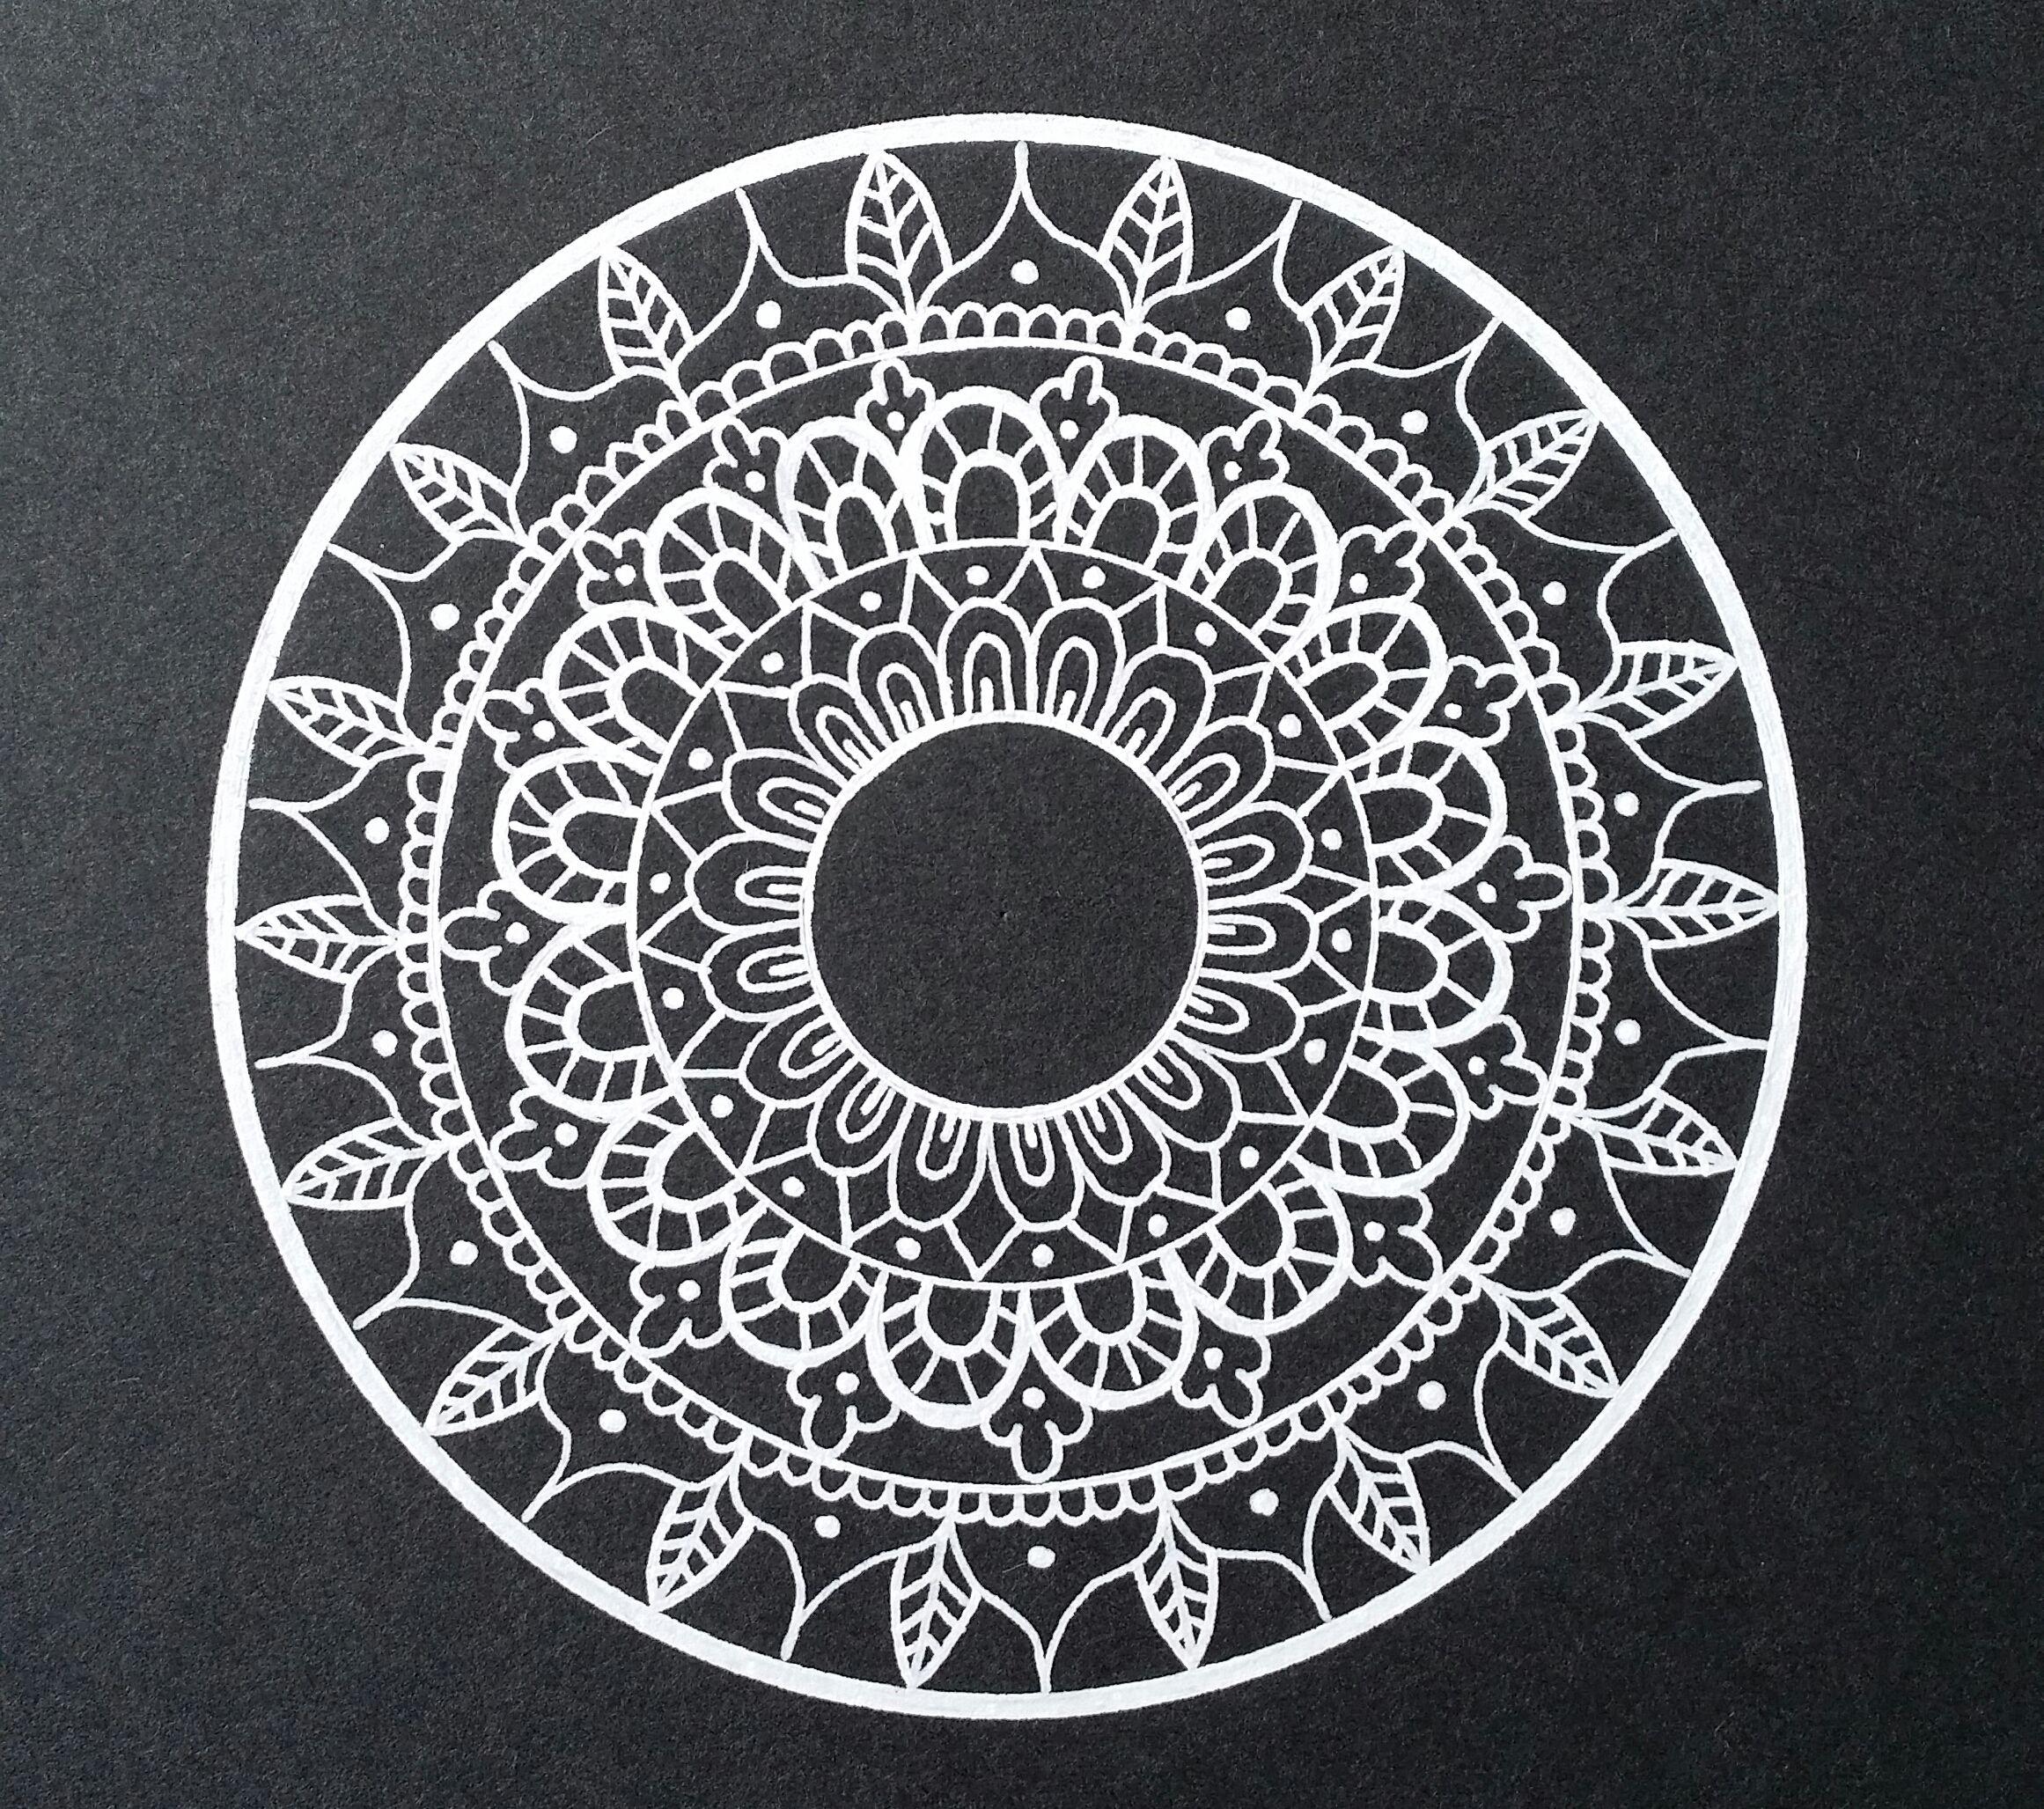 Black and White mandala - Drawn freehand - Gellyroll White pen ...